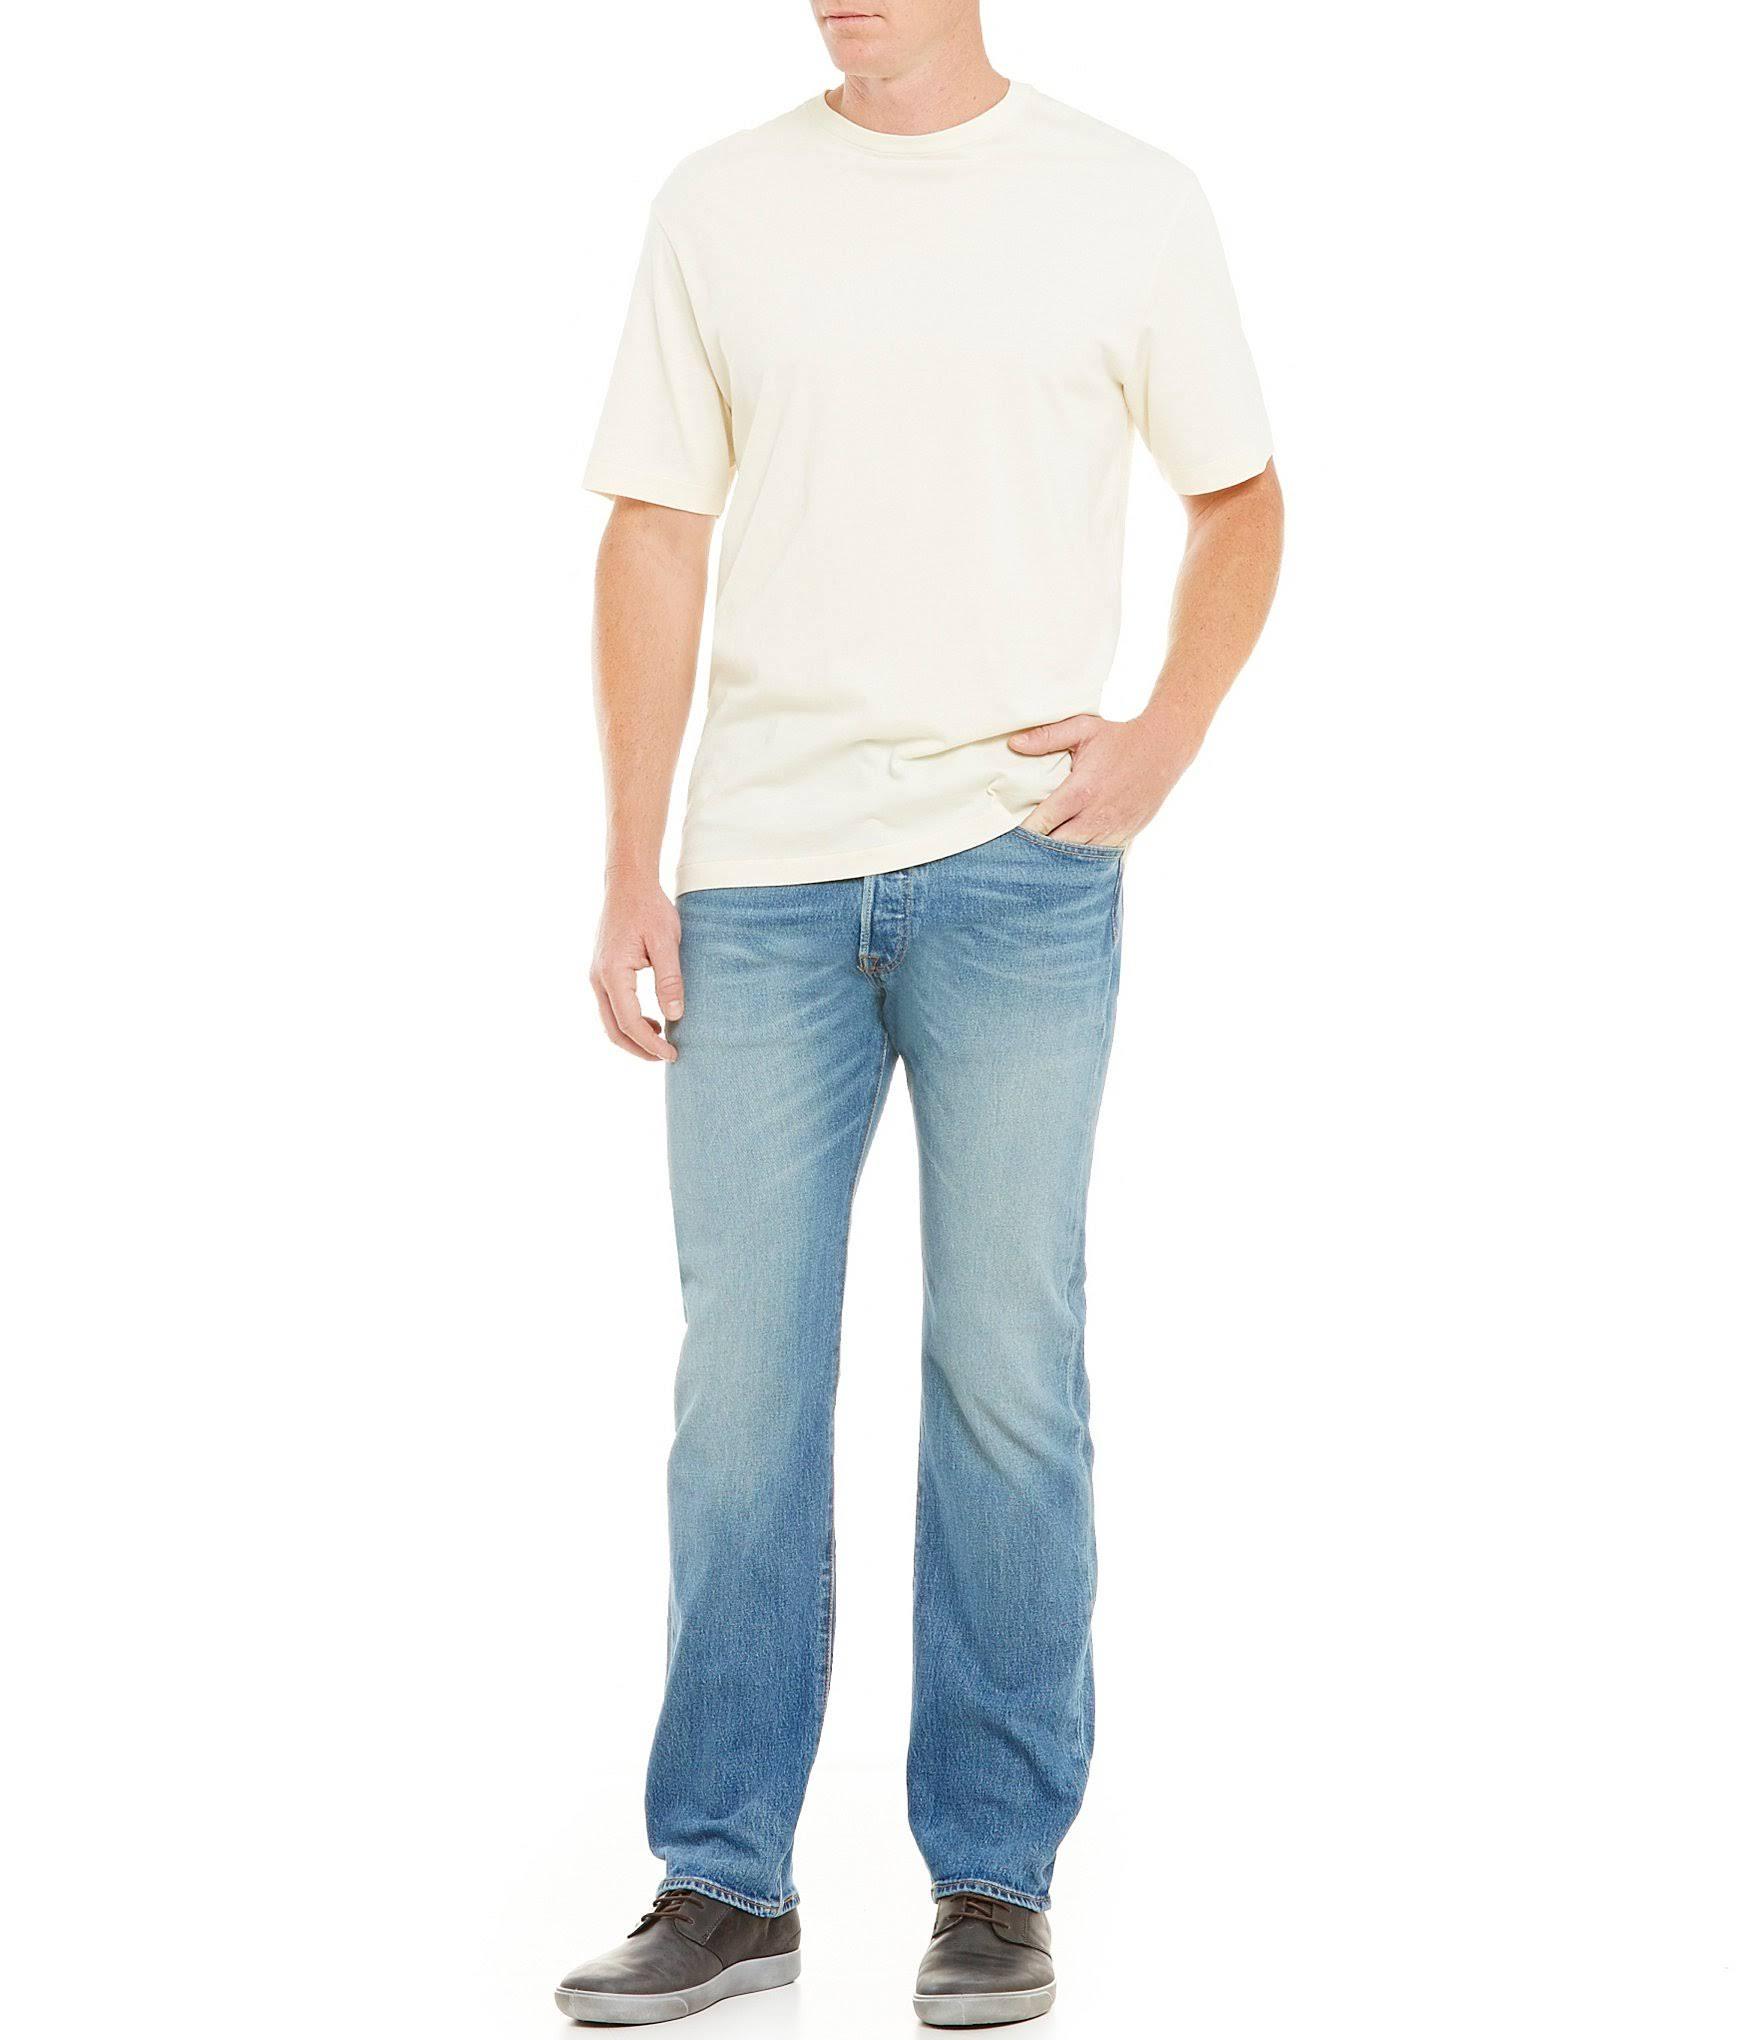 The Ben Original Stretch Jeans Fit 501 30 31 Levi's Cxw46qZAW